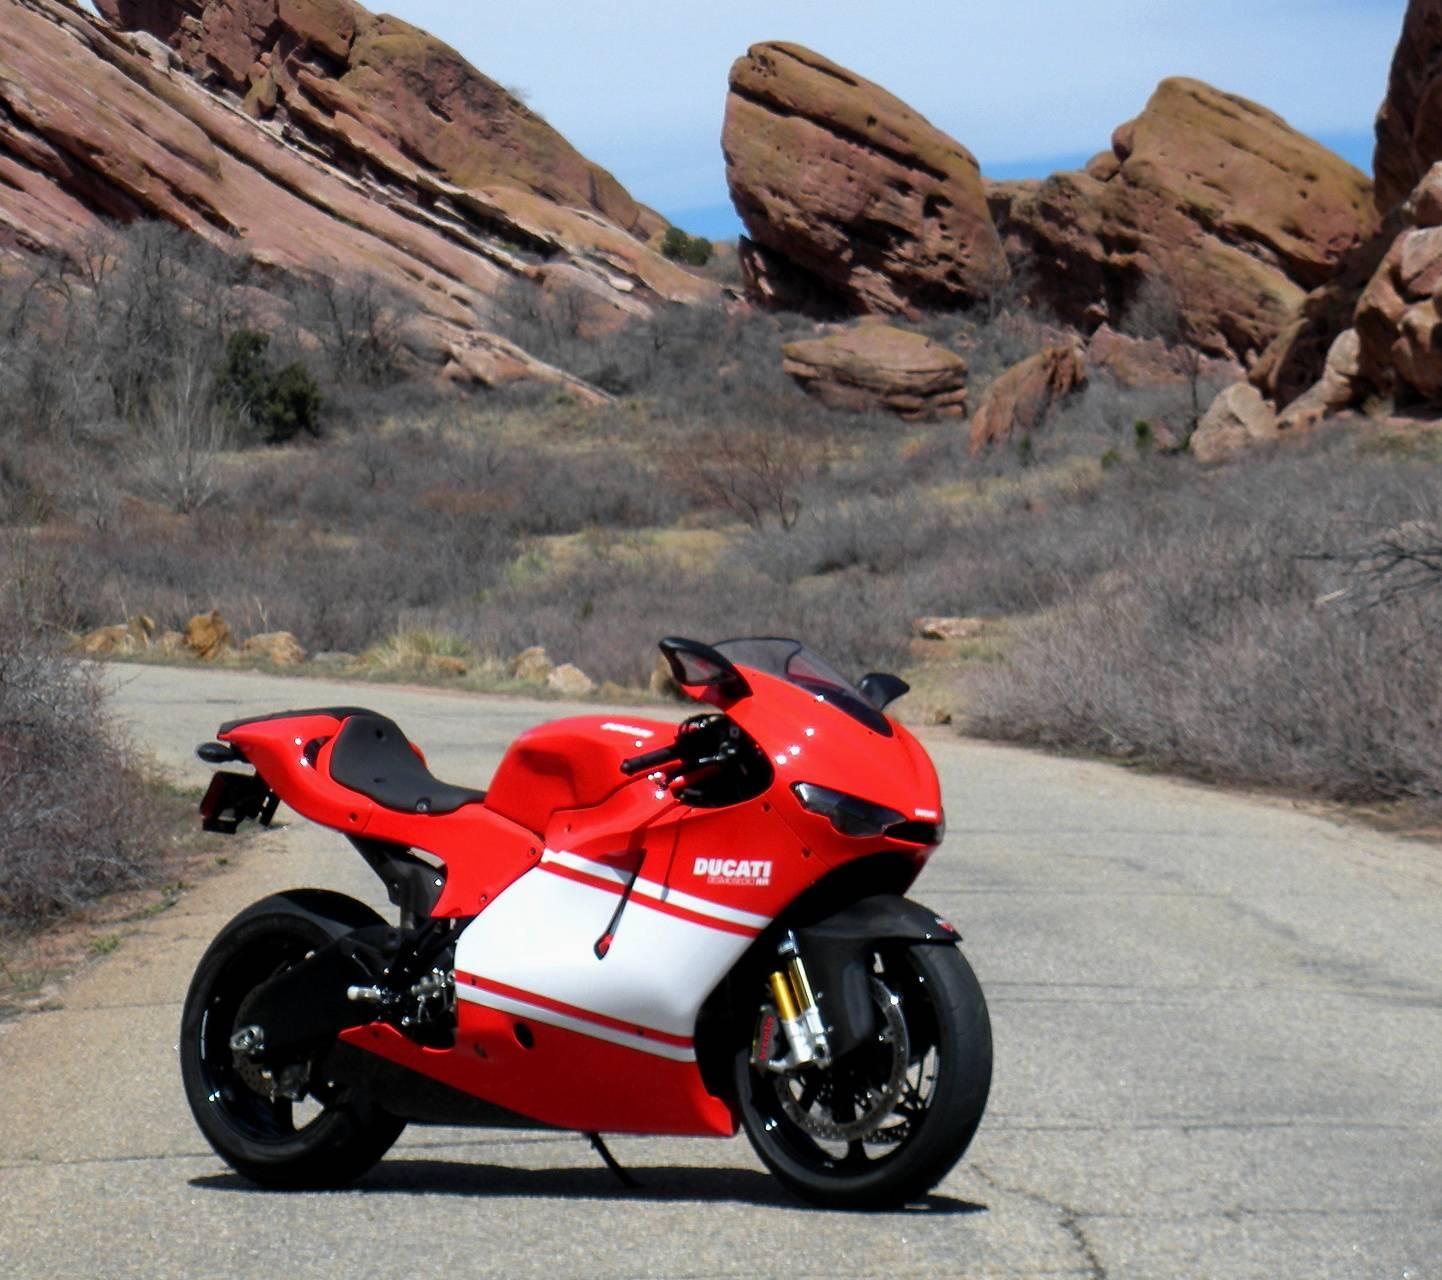 Ducati Bike Photo